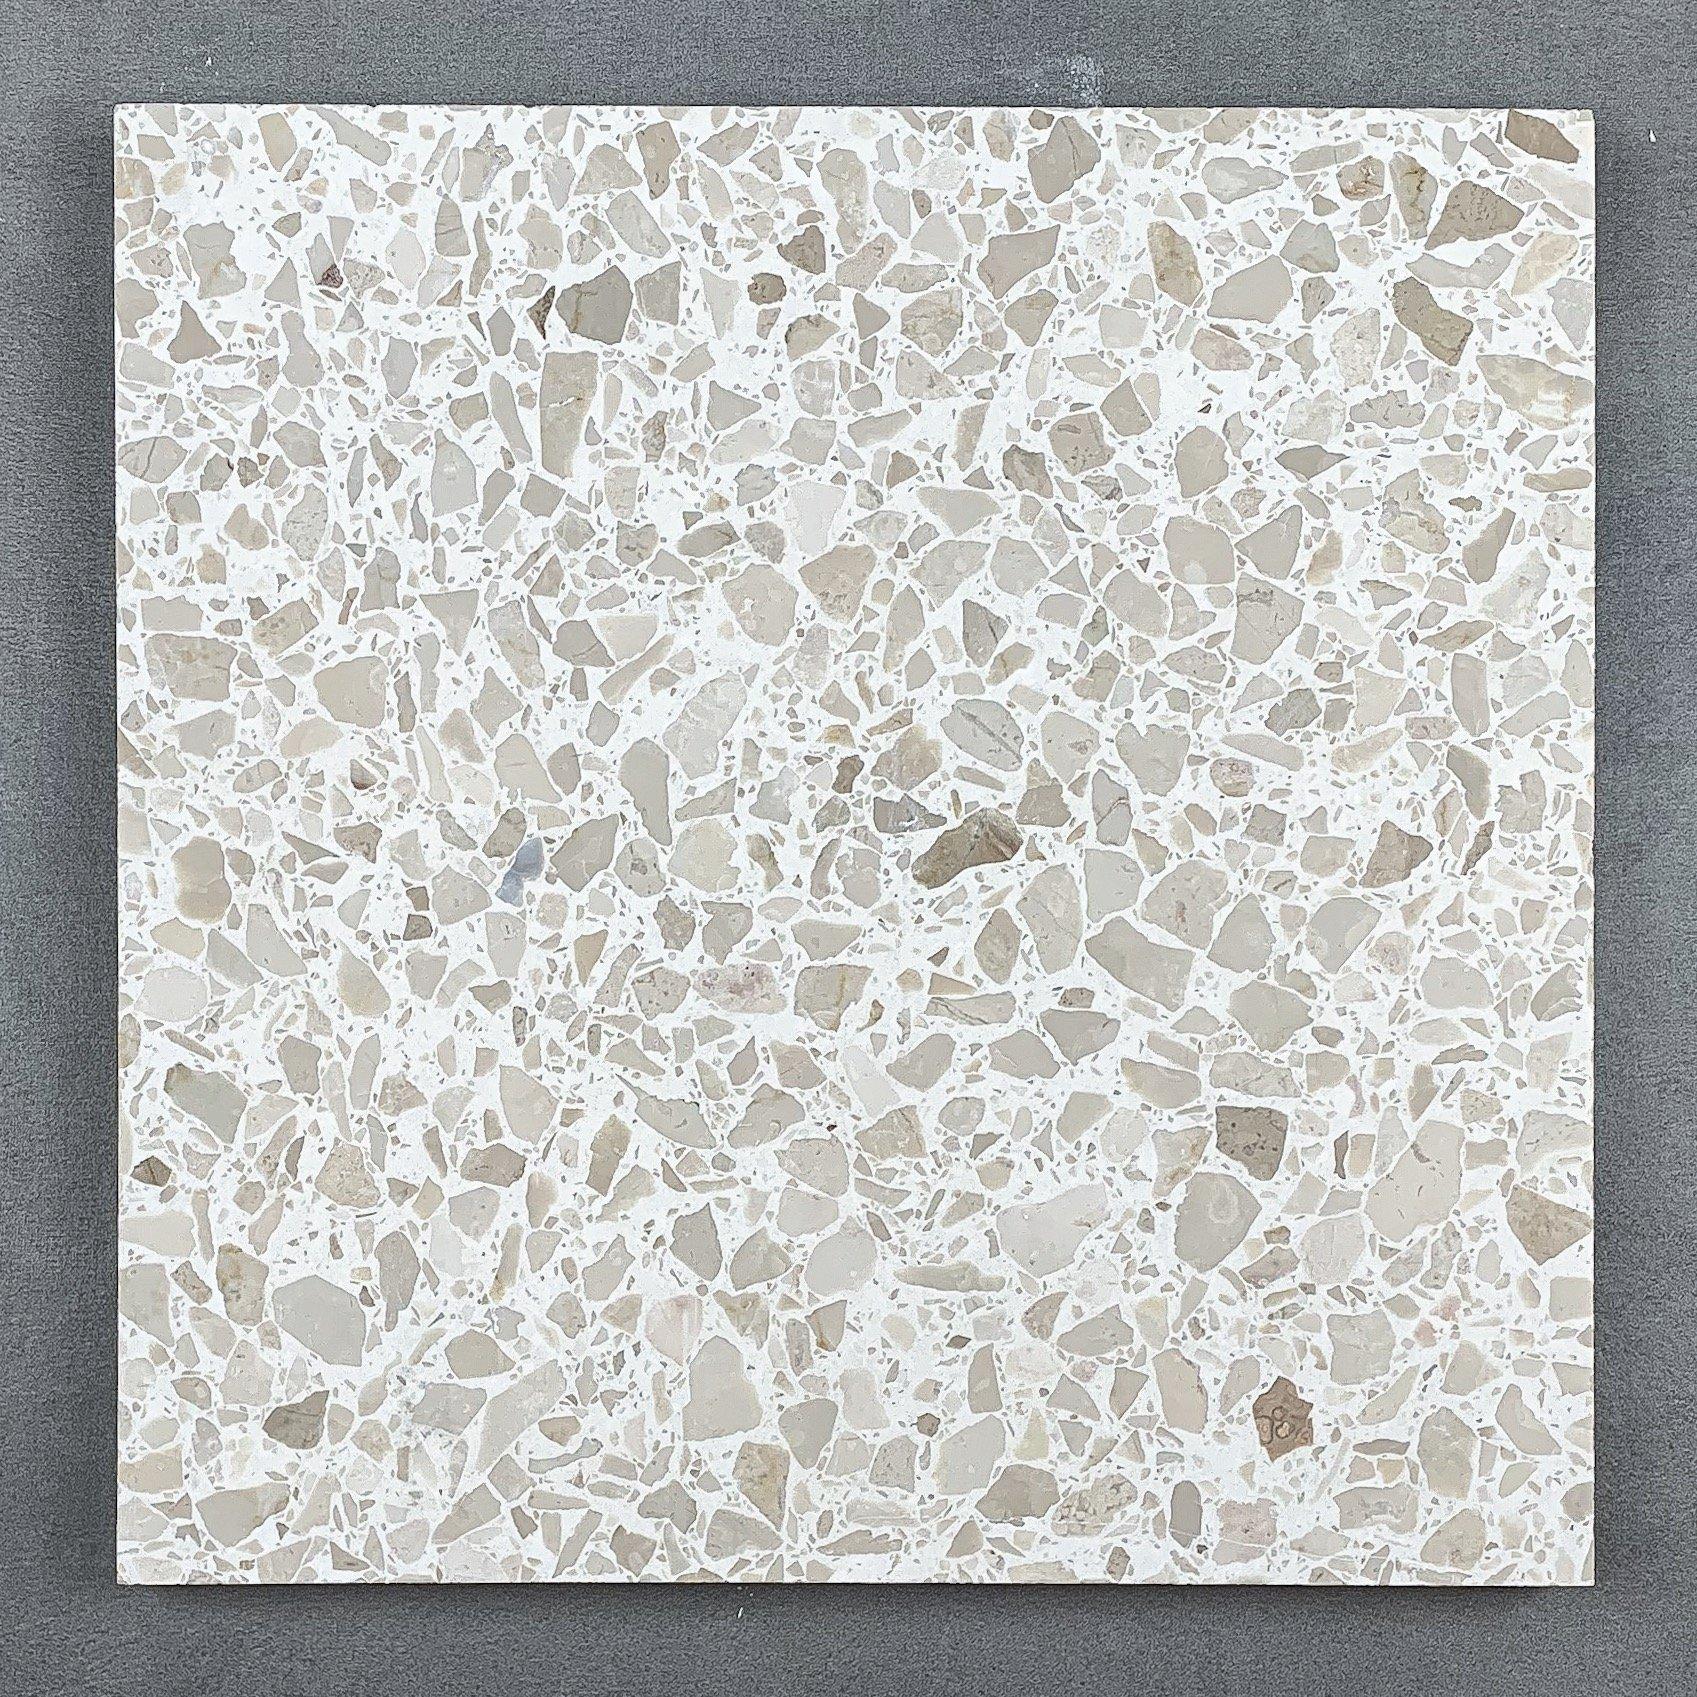 Praso 25mm Terrazzo Tiles